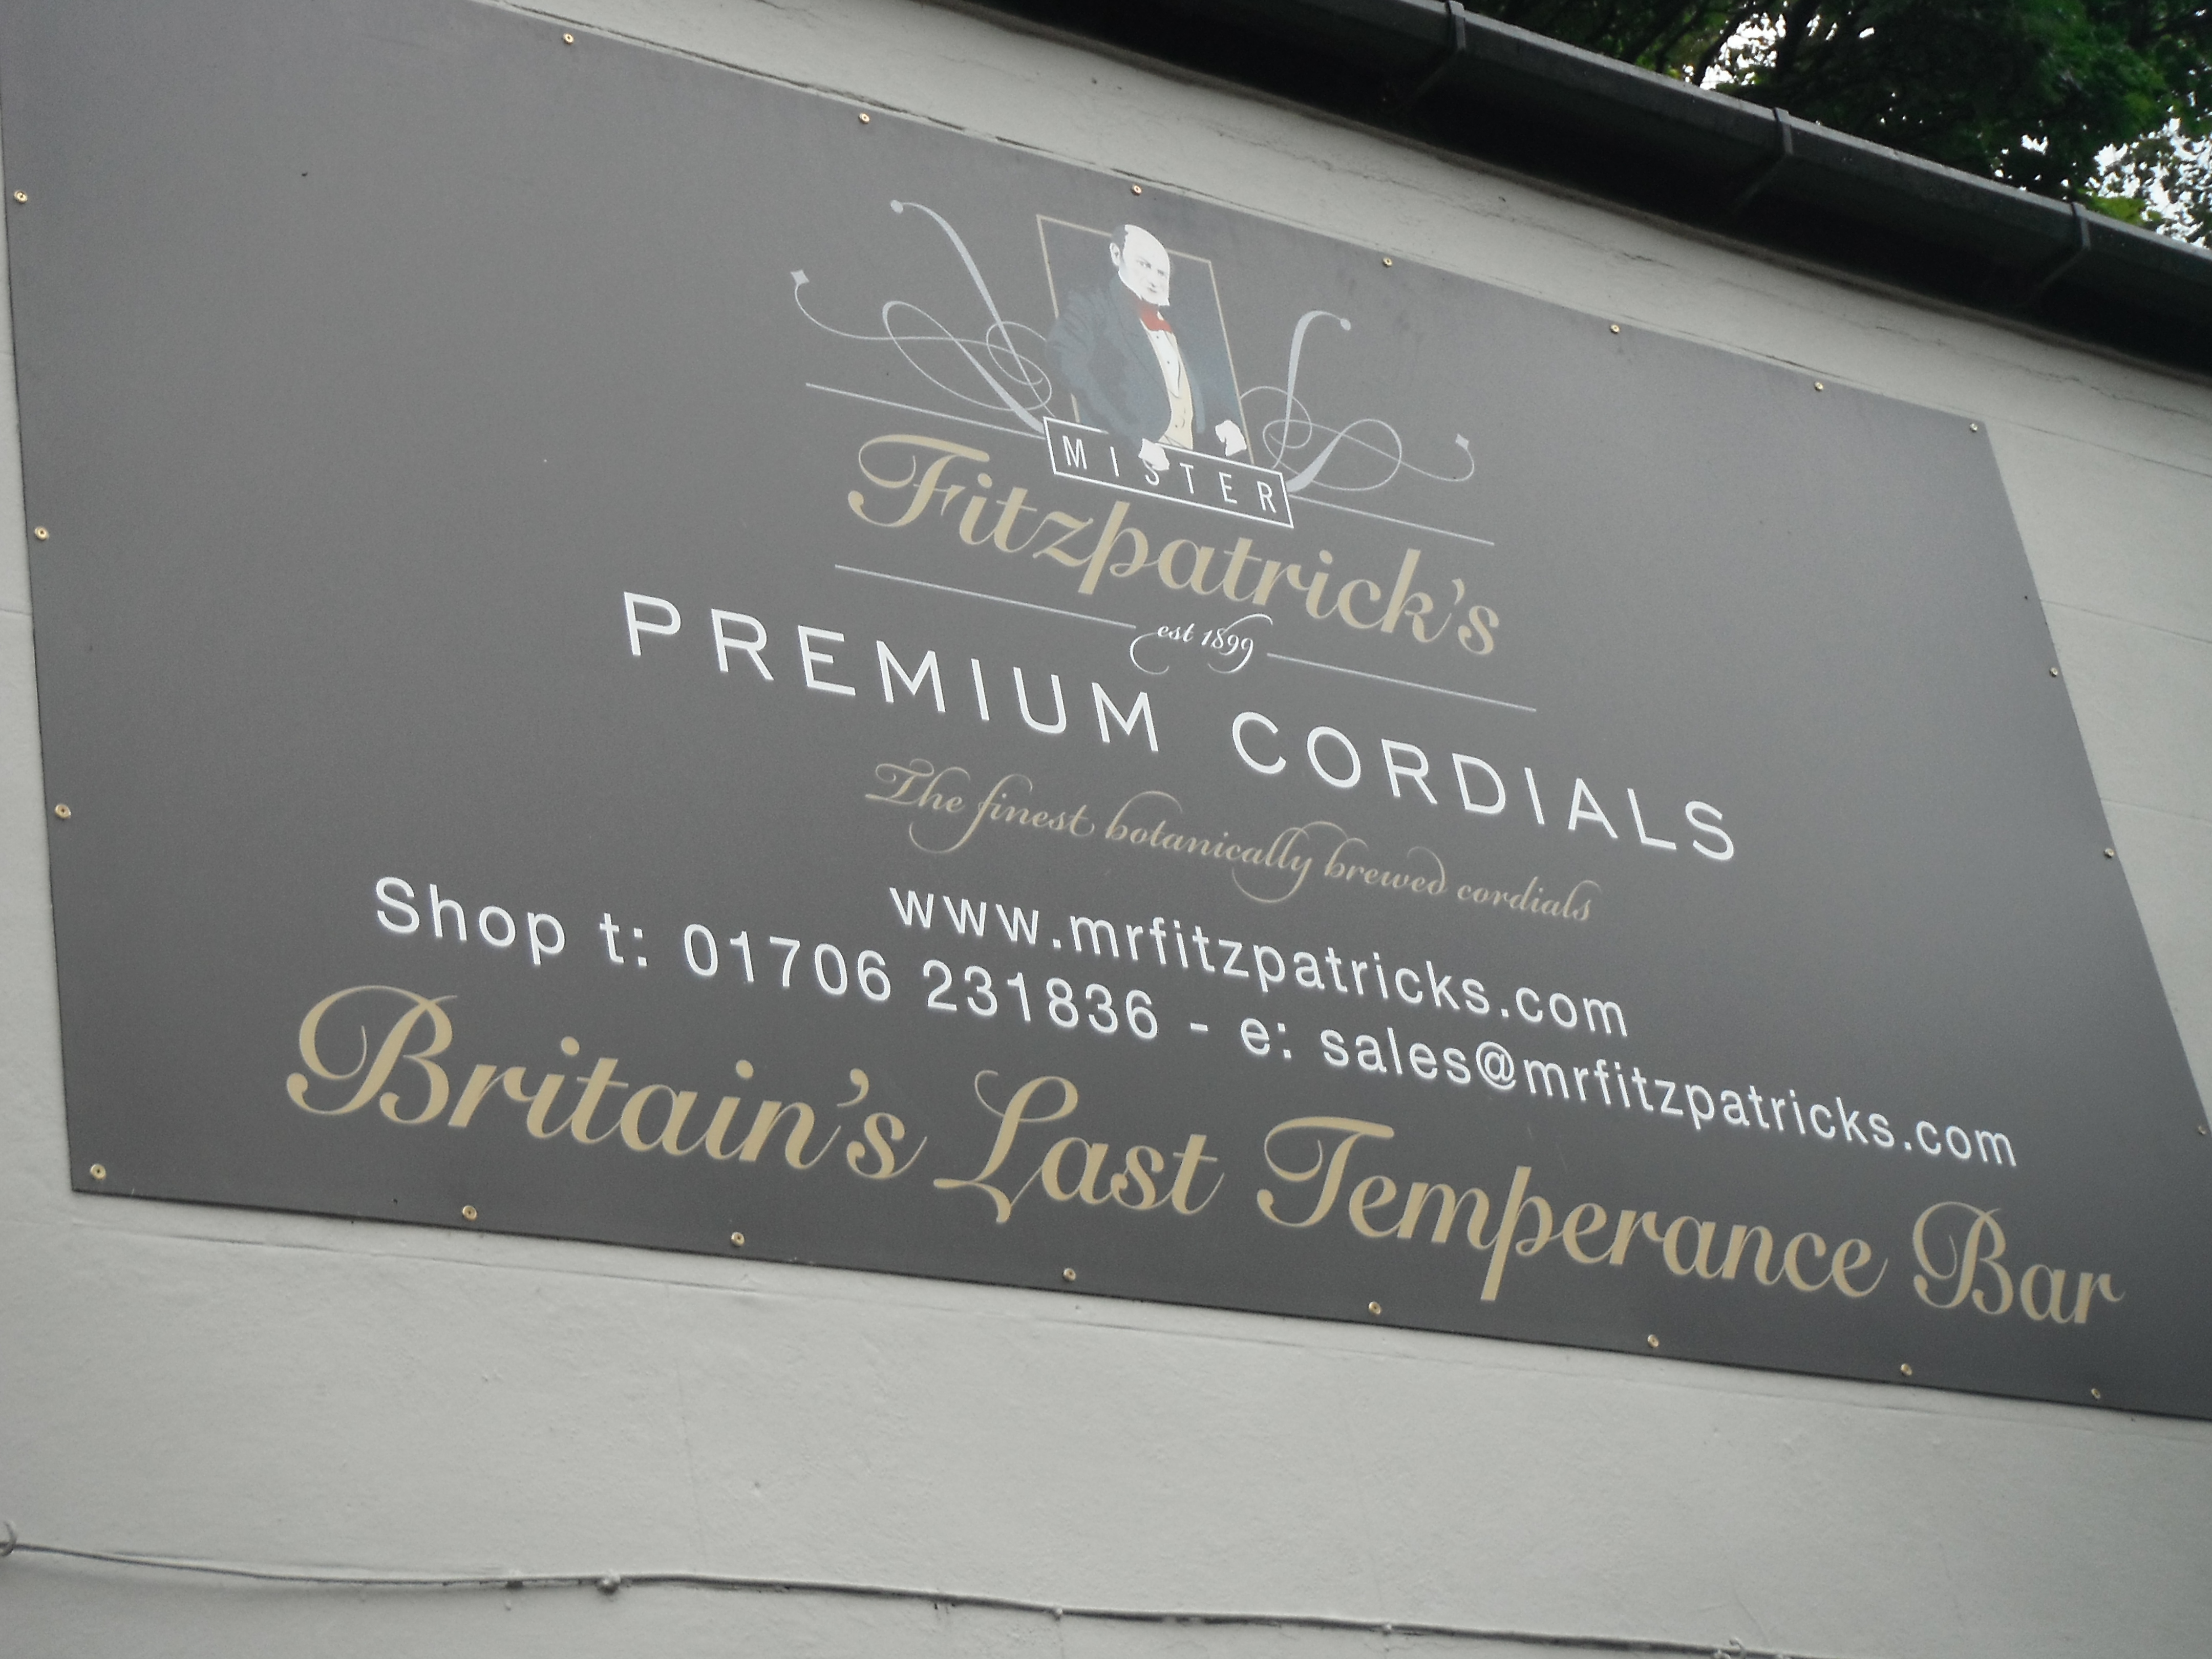 Photo taken by me – the non-pub sign for Mr Fitzpatrick's, Rawtenstal, Lancashire